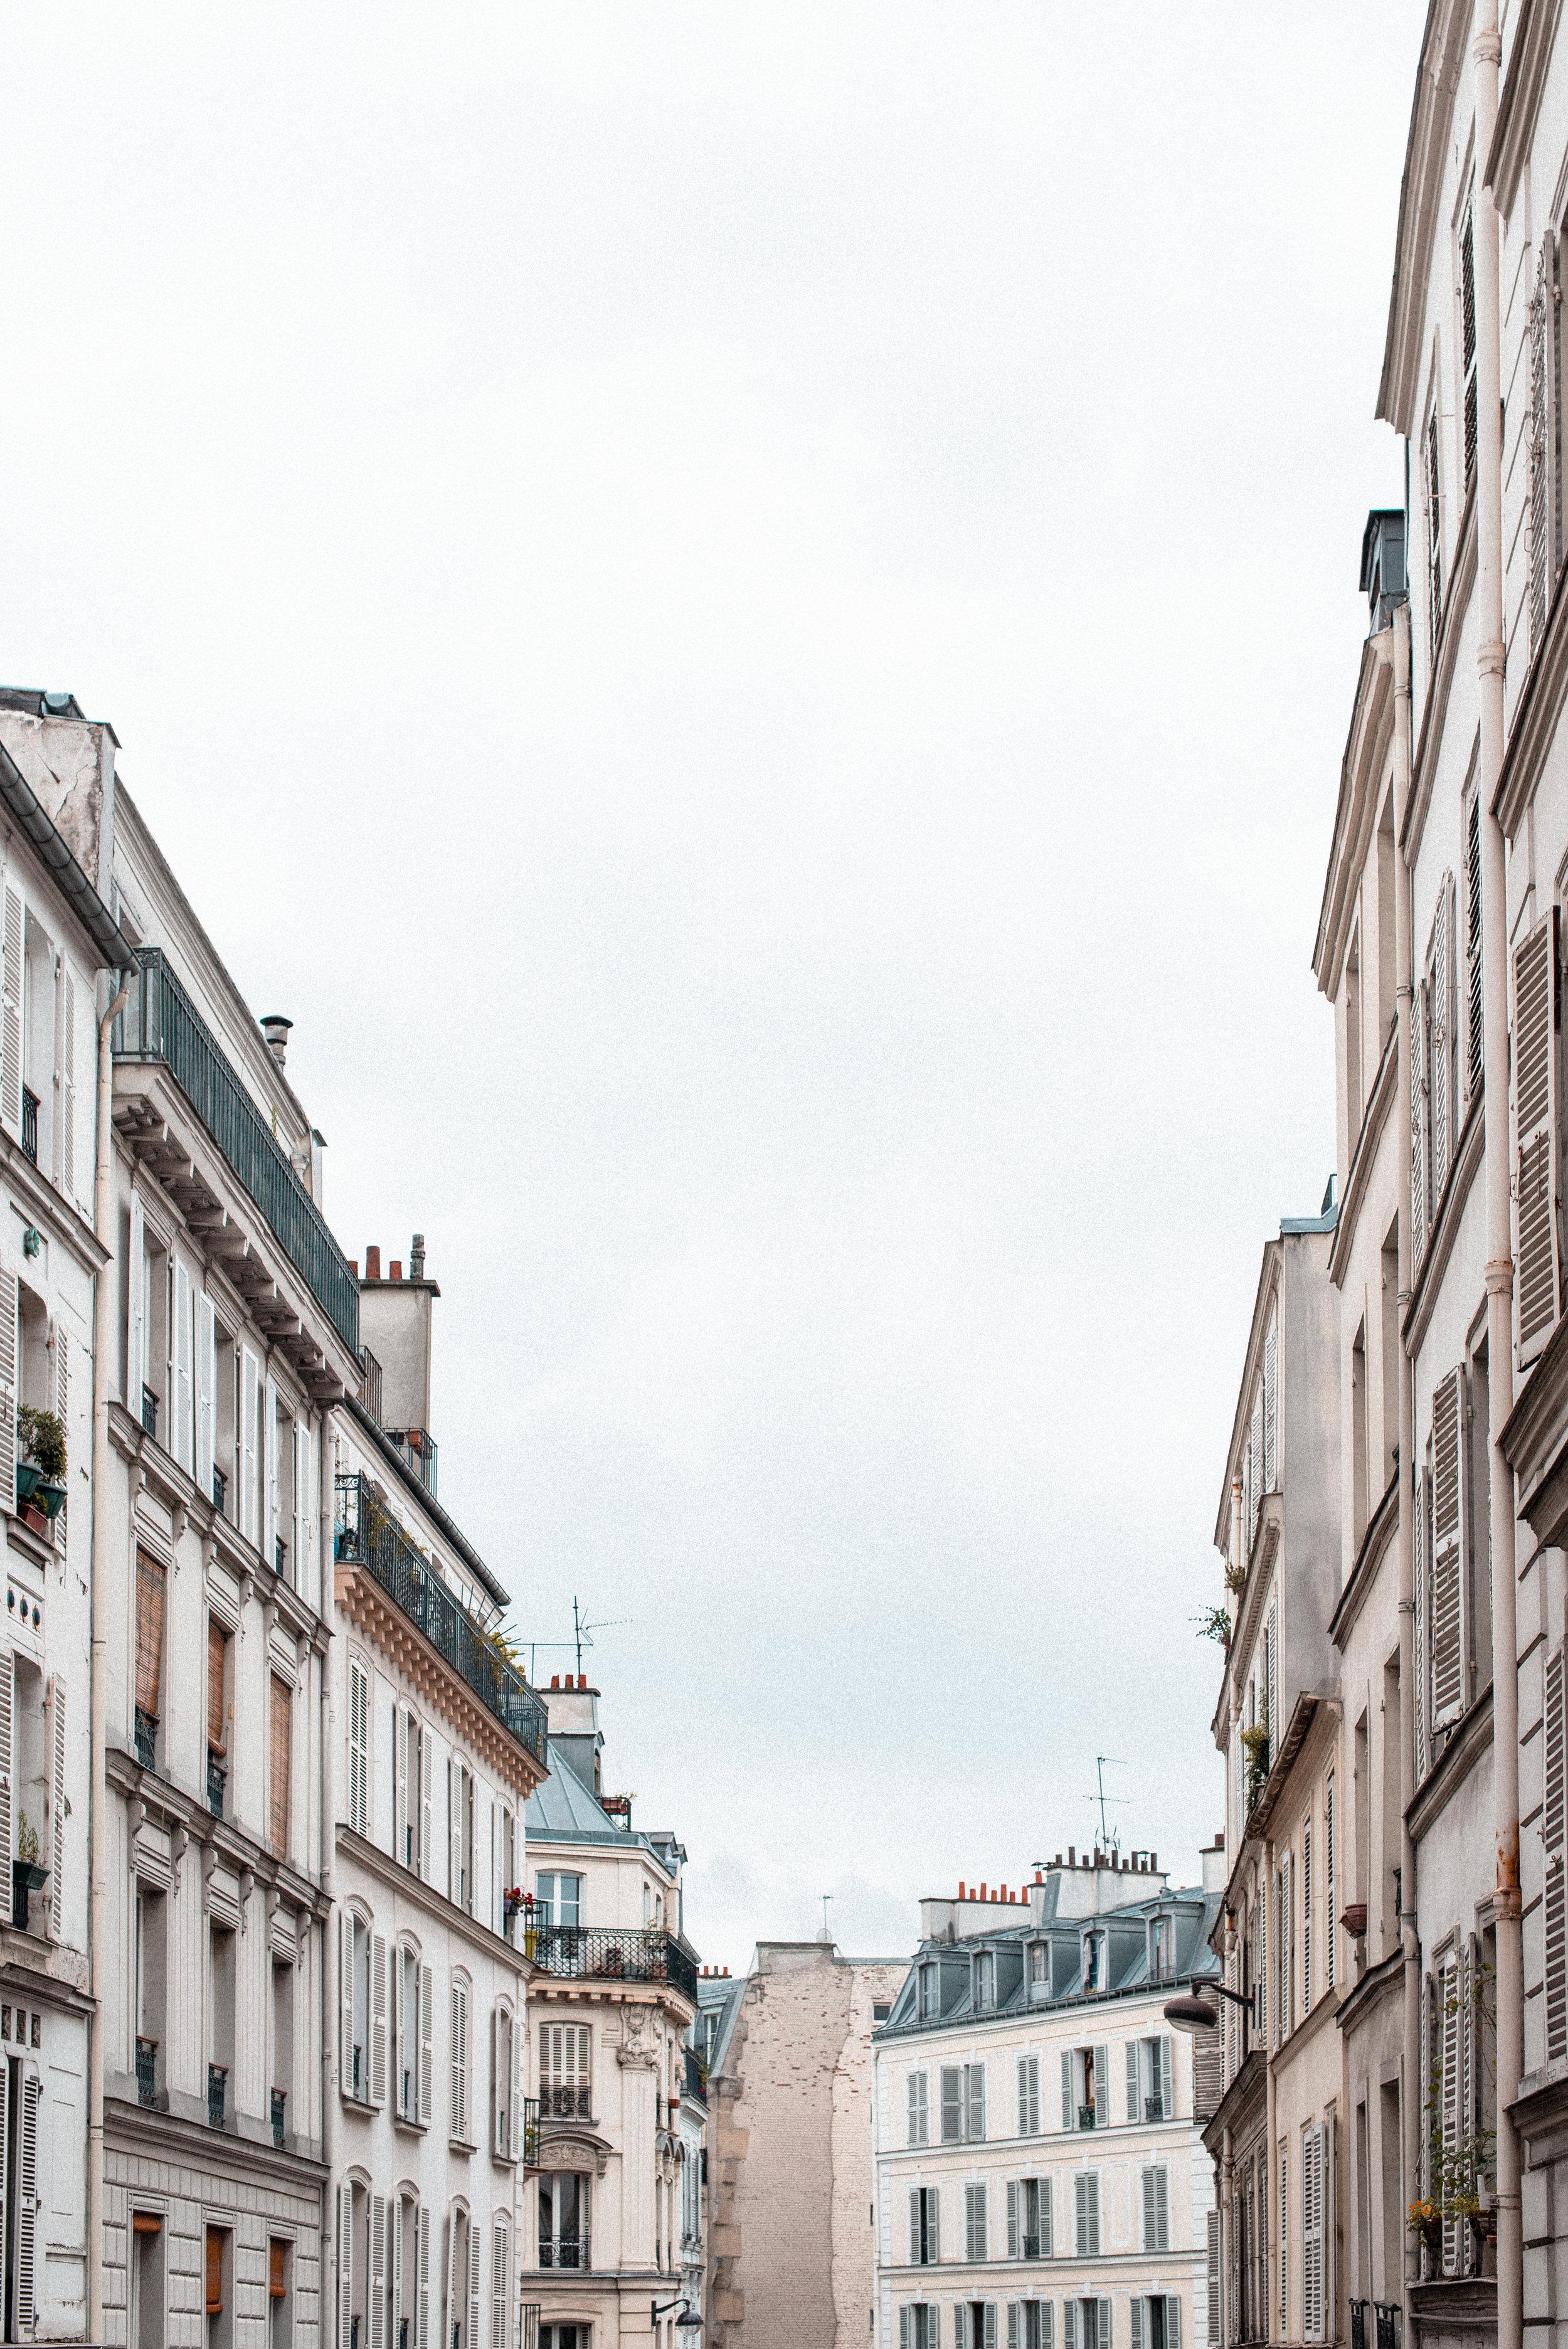 Paris, France // Photo by Carley Rudd